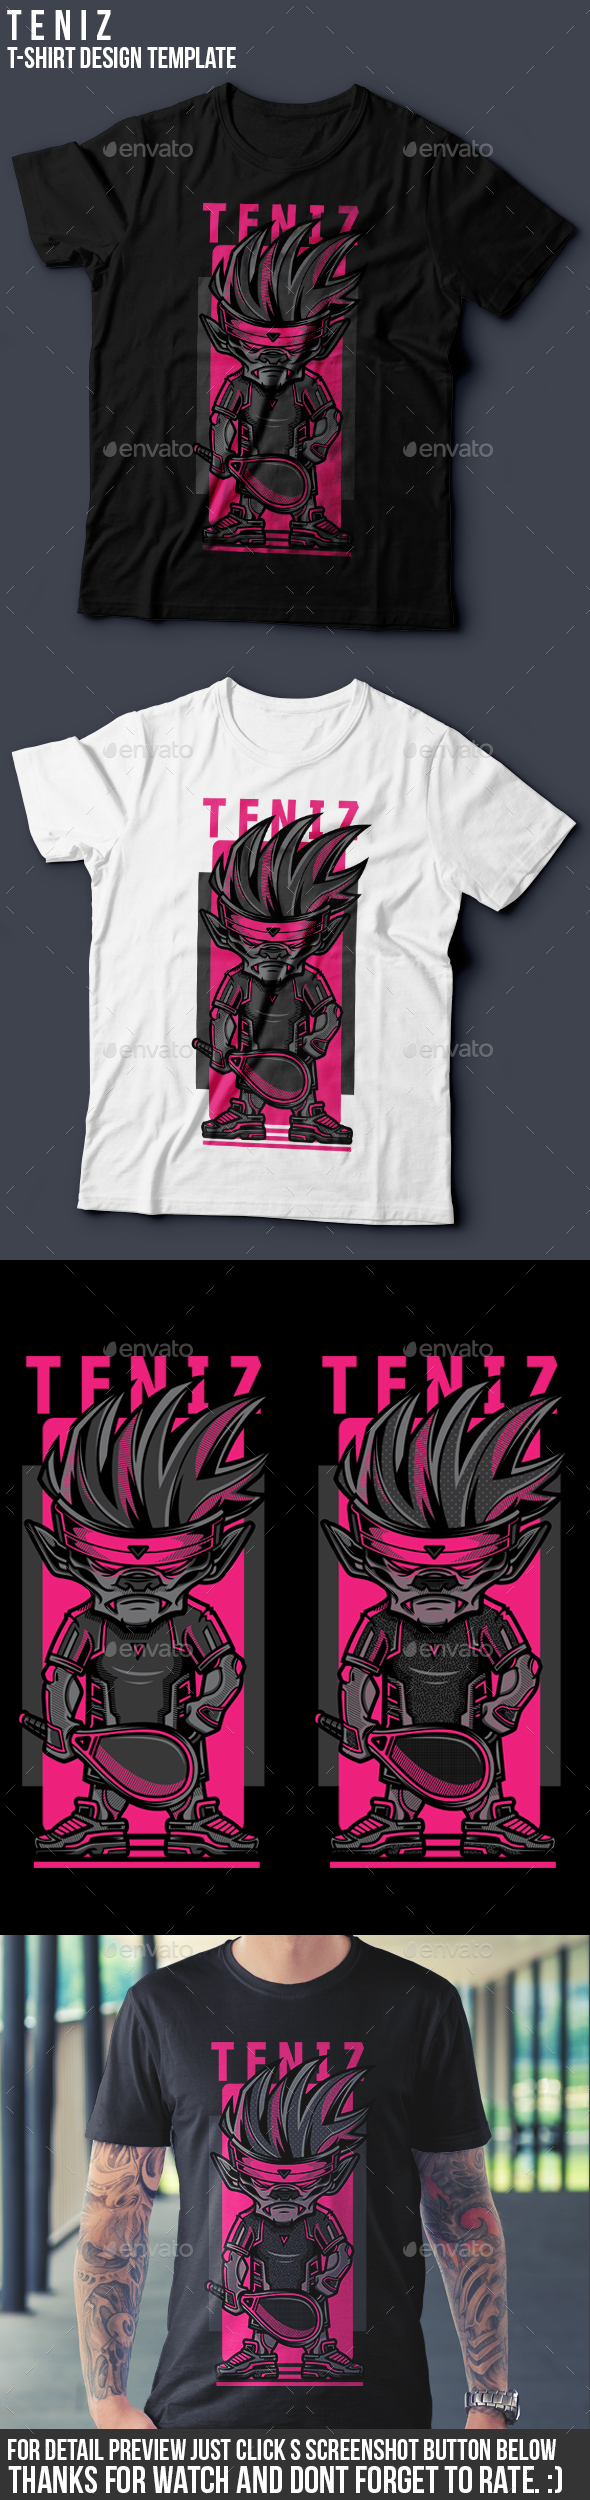 Teniz T-Shirt Design - Sports & Teams T-Shirts